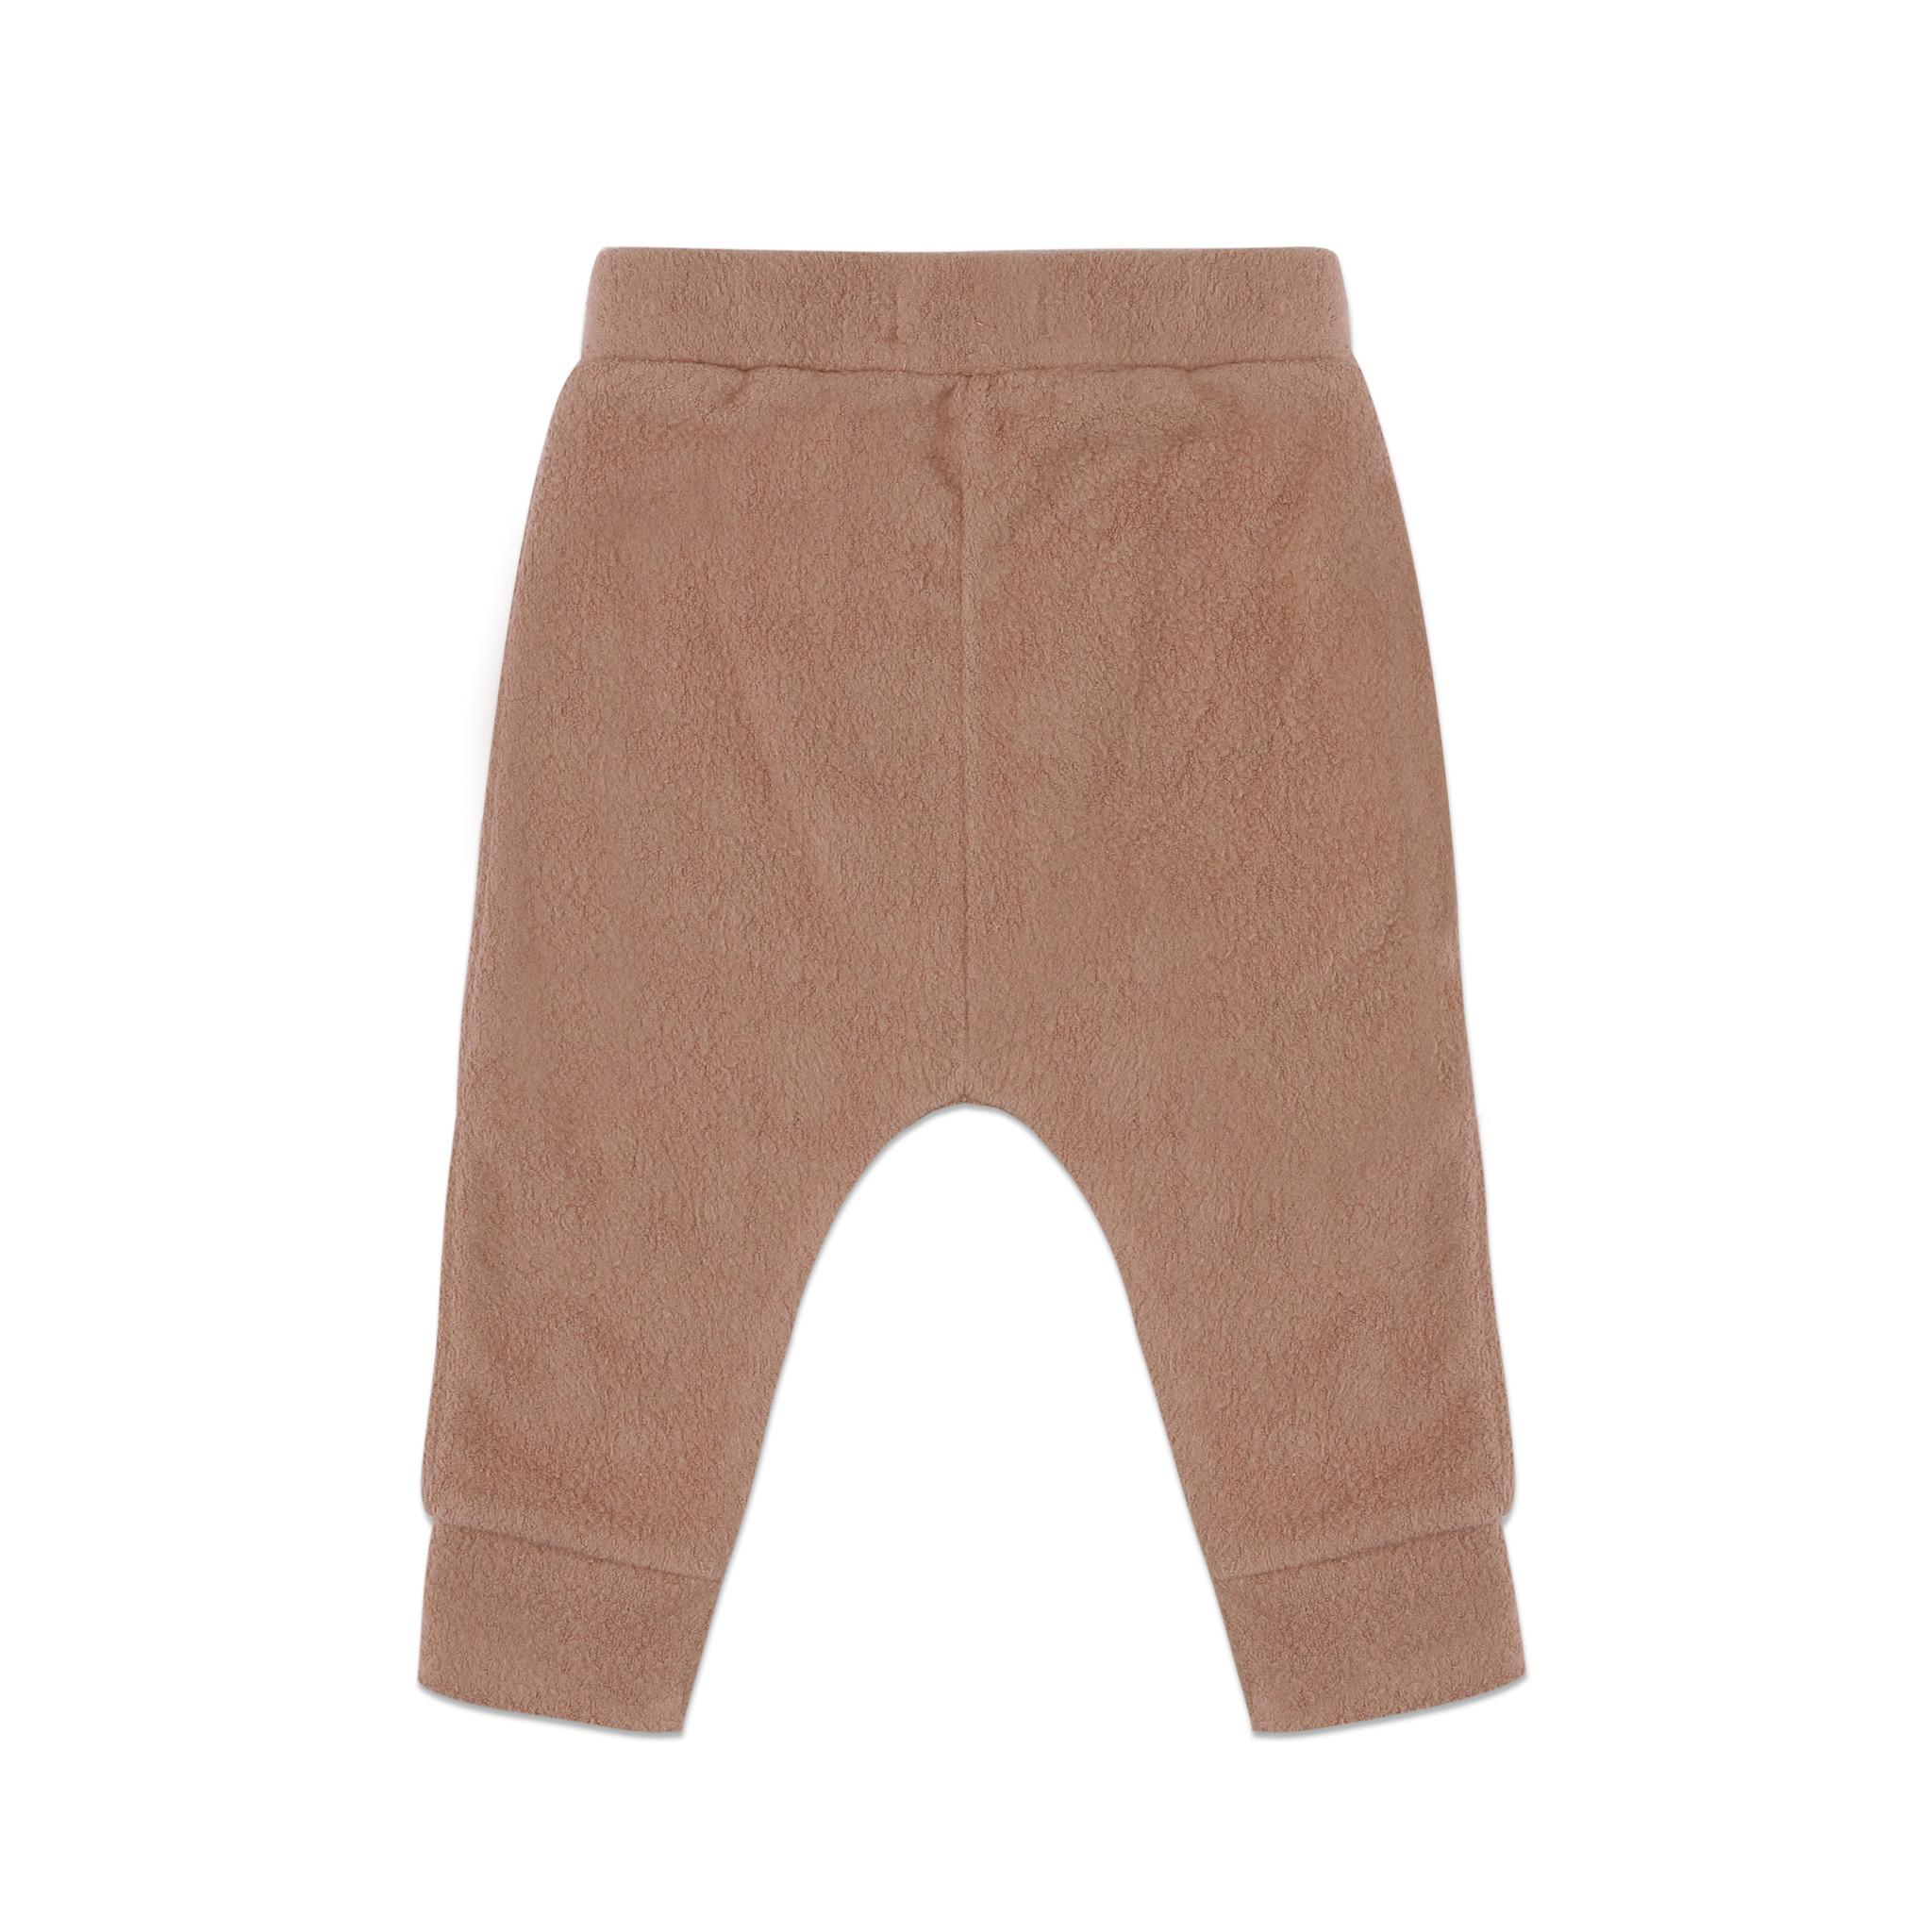 Teddy baby harem pants - creamy mocha-3